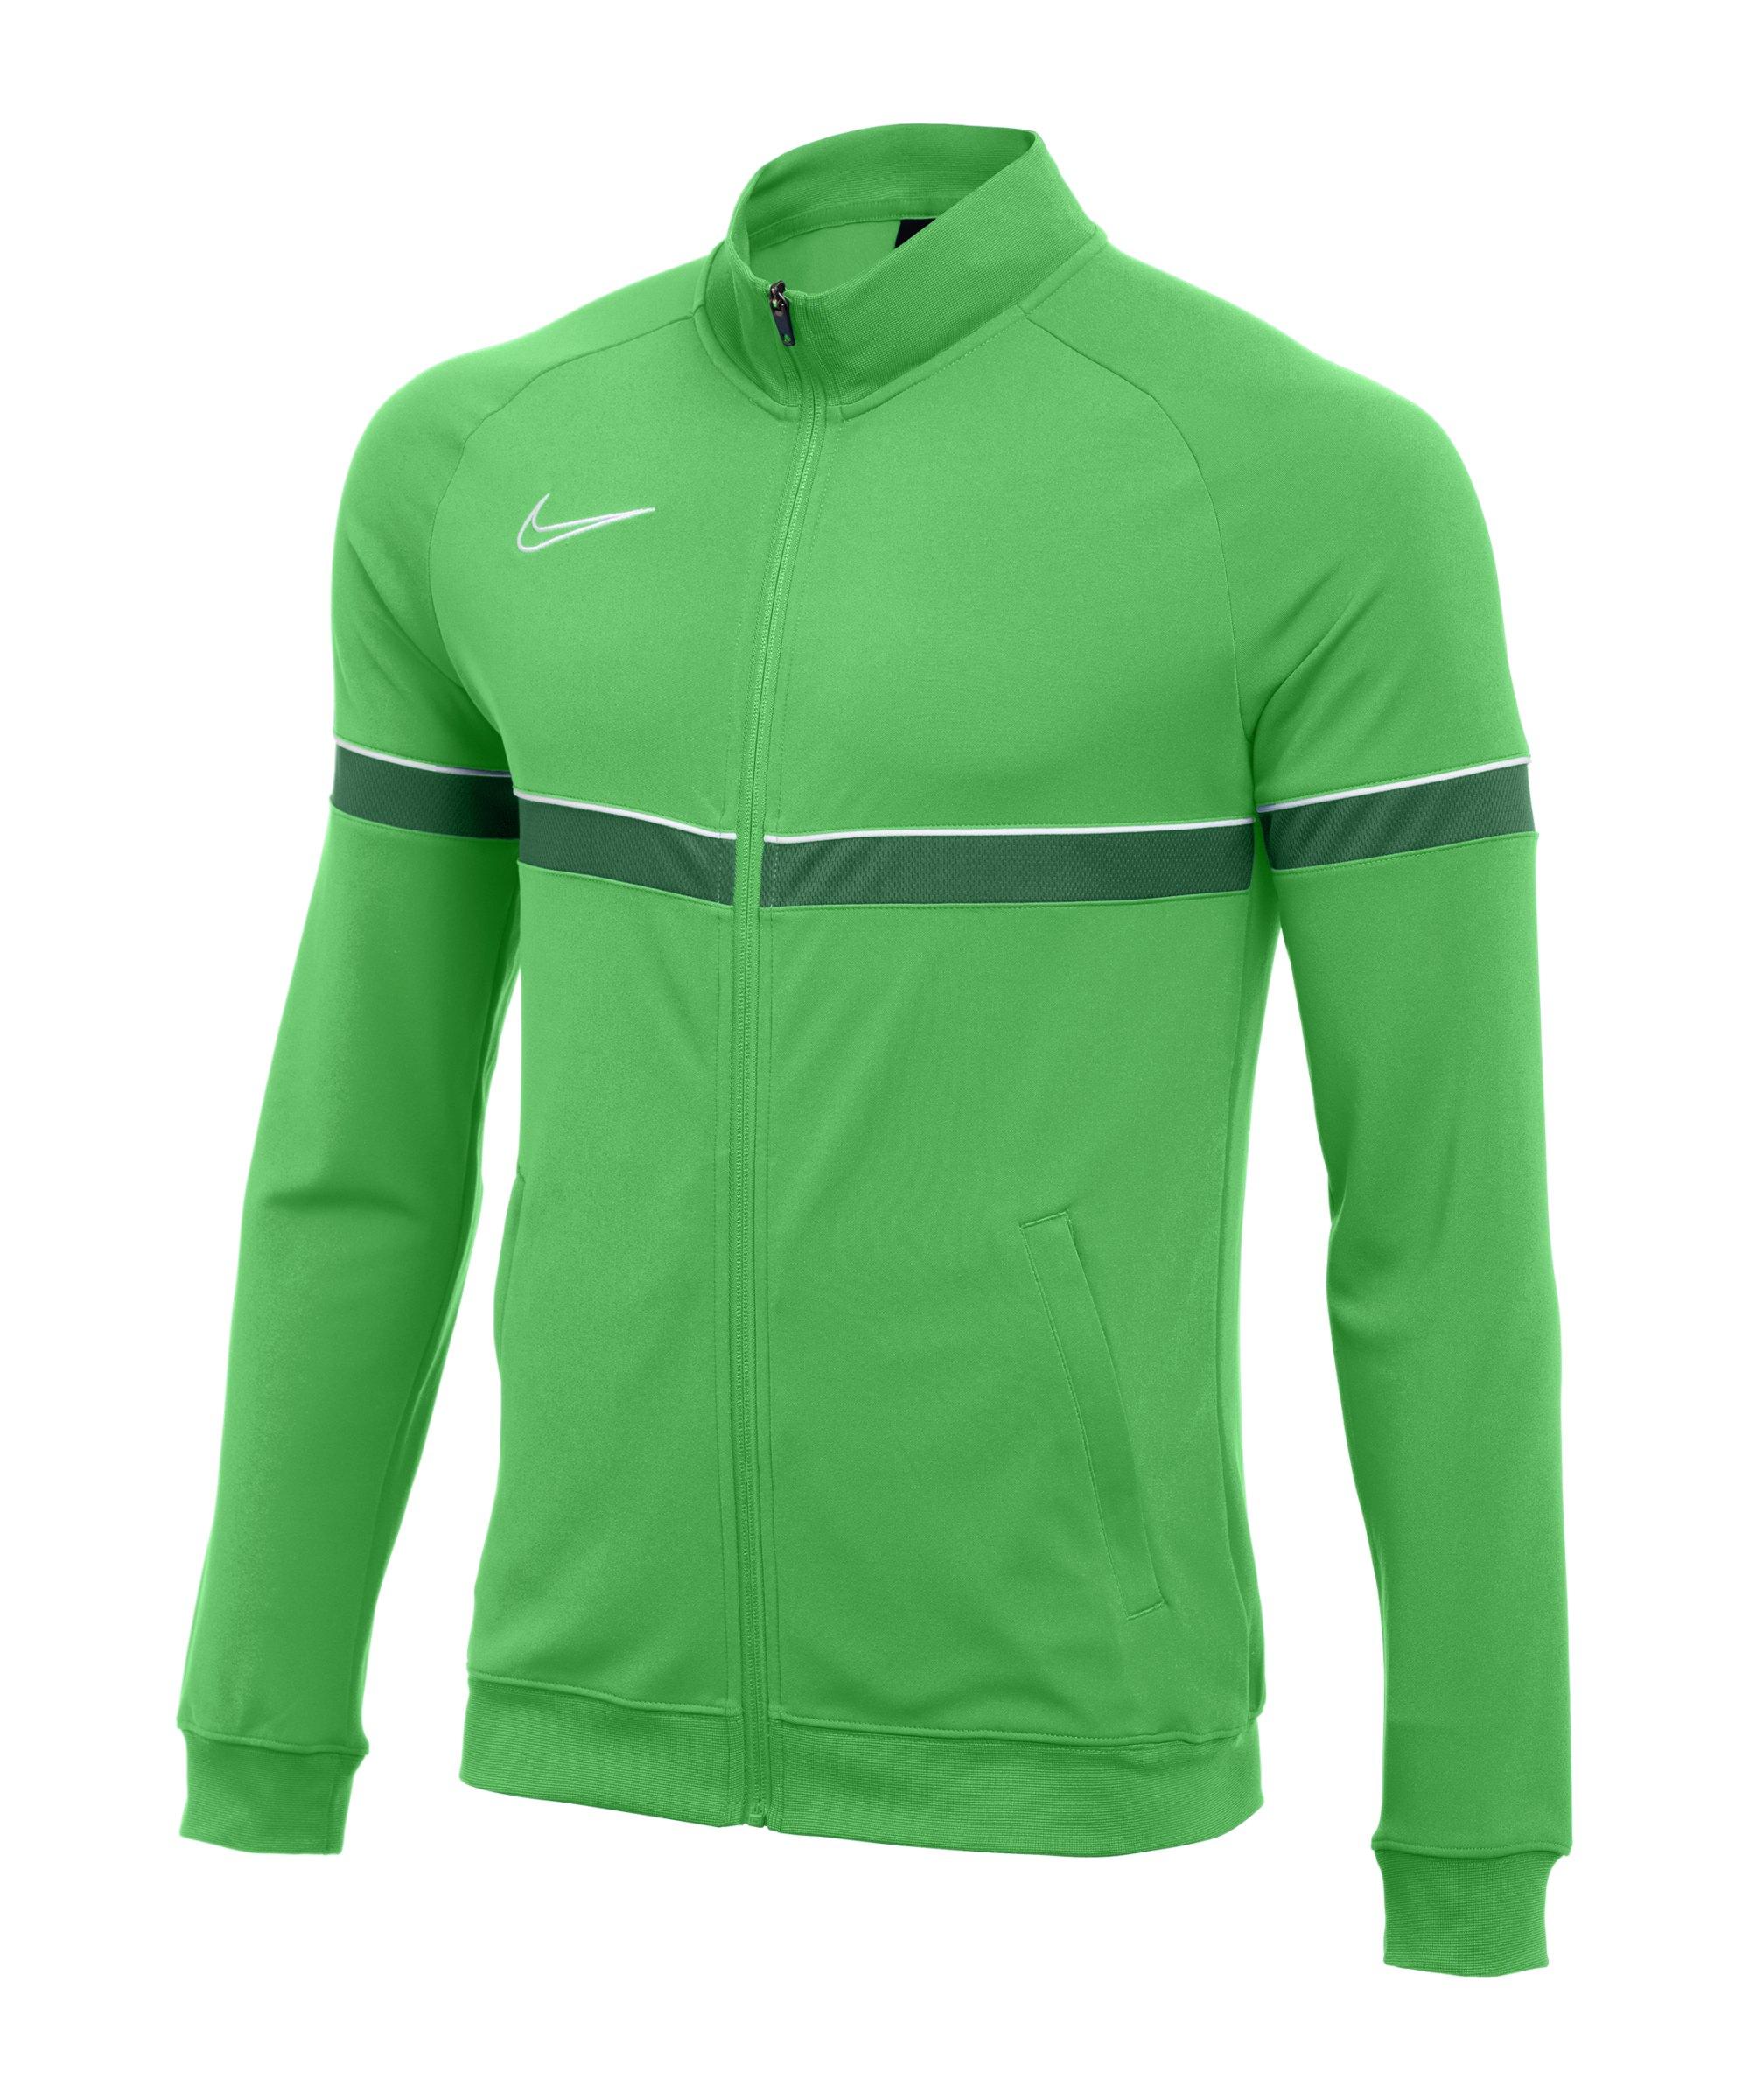 Nike Academy 21 Knit Trainingsjacke Grün F362 - gruen